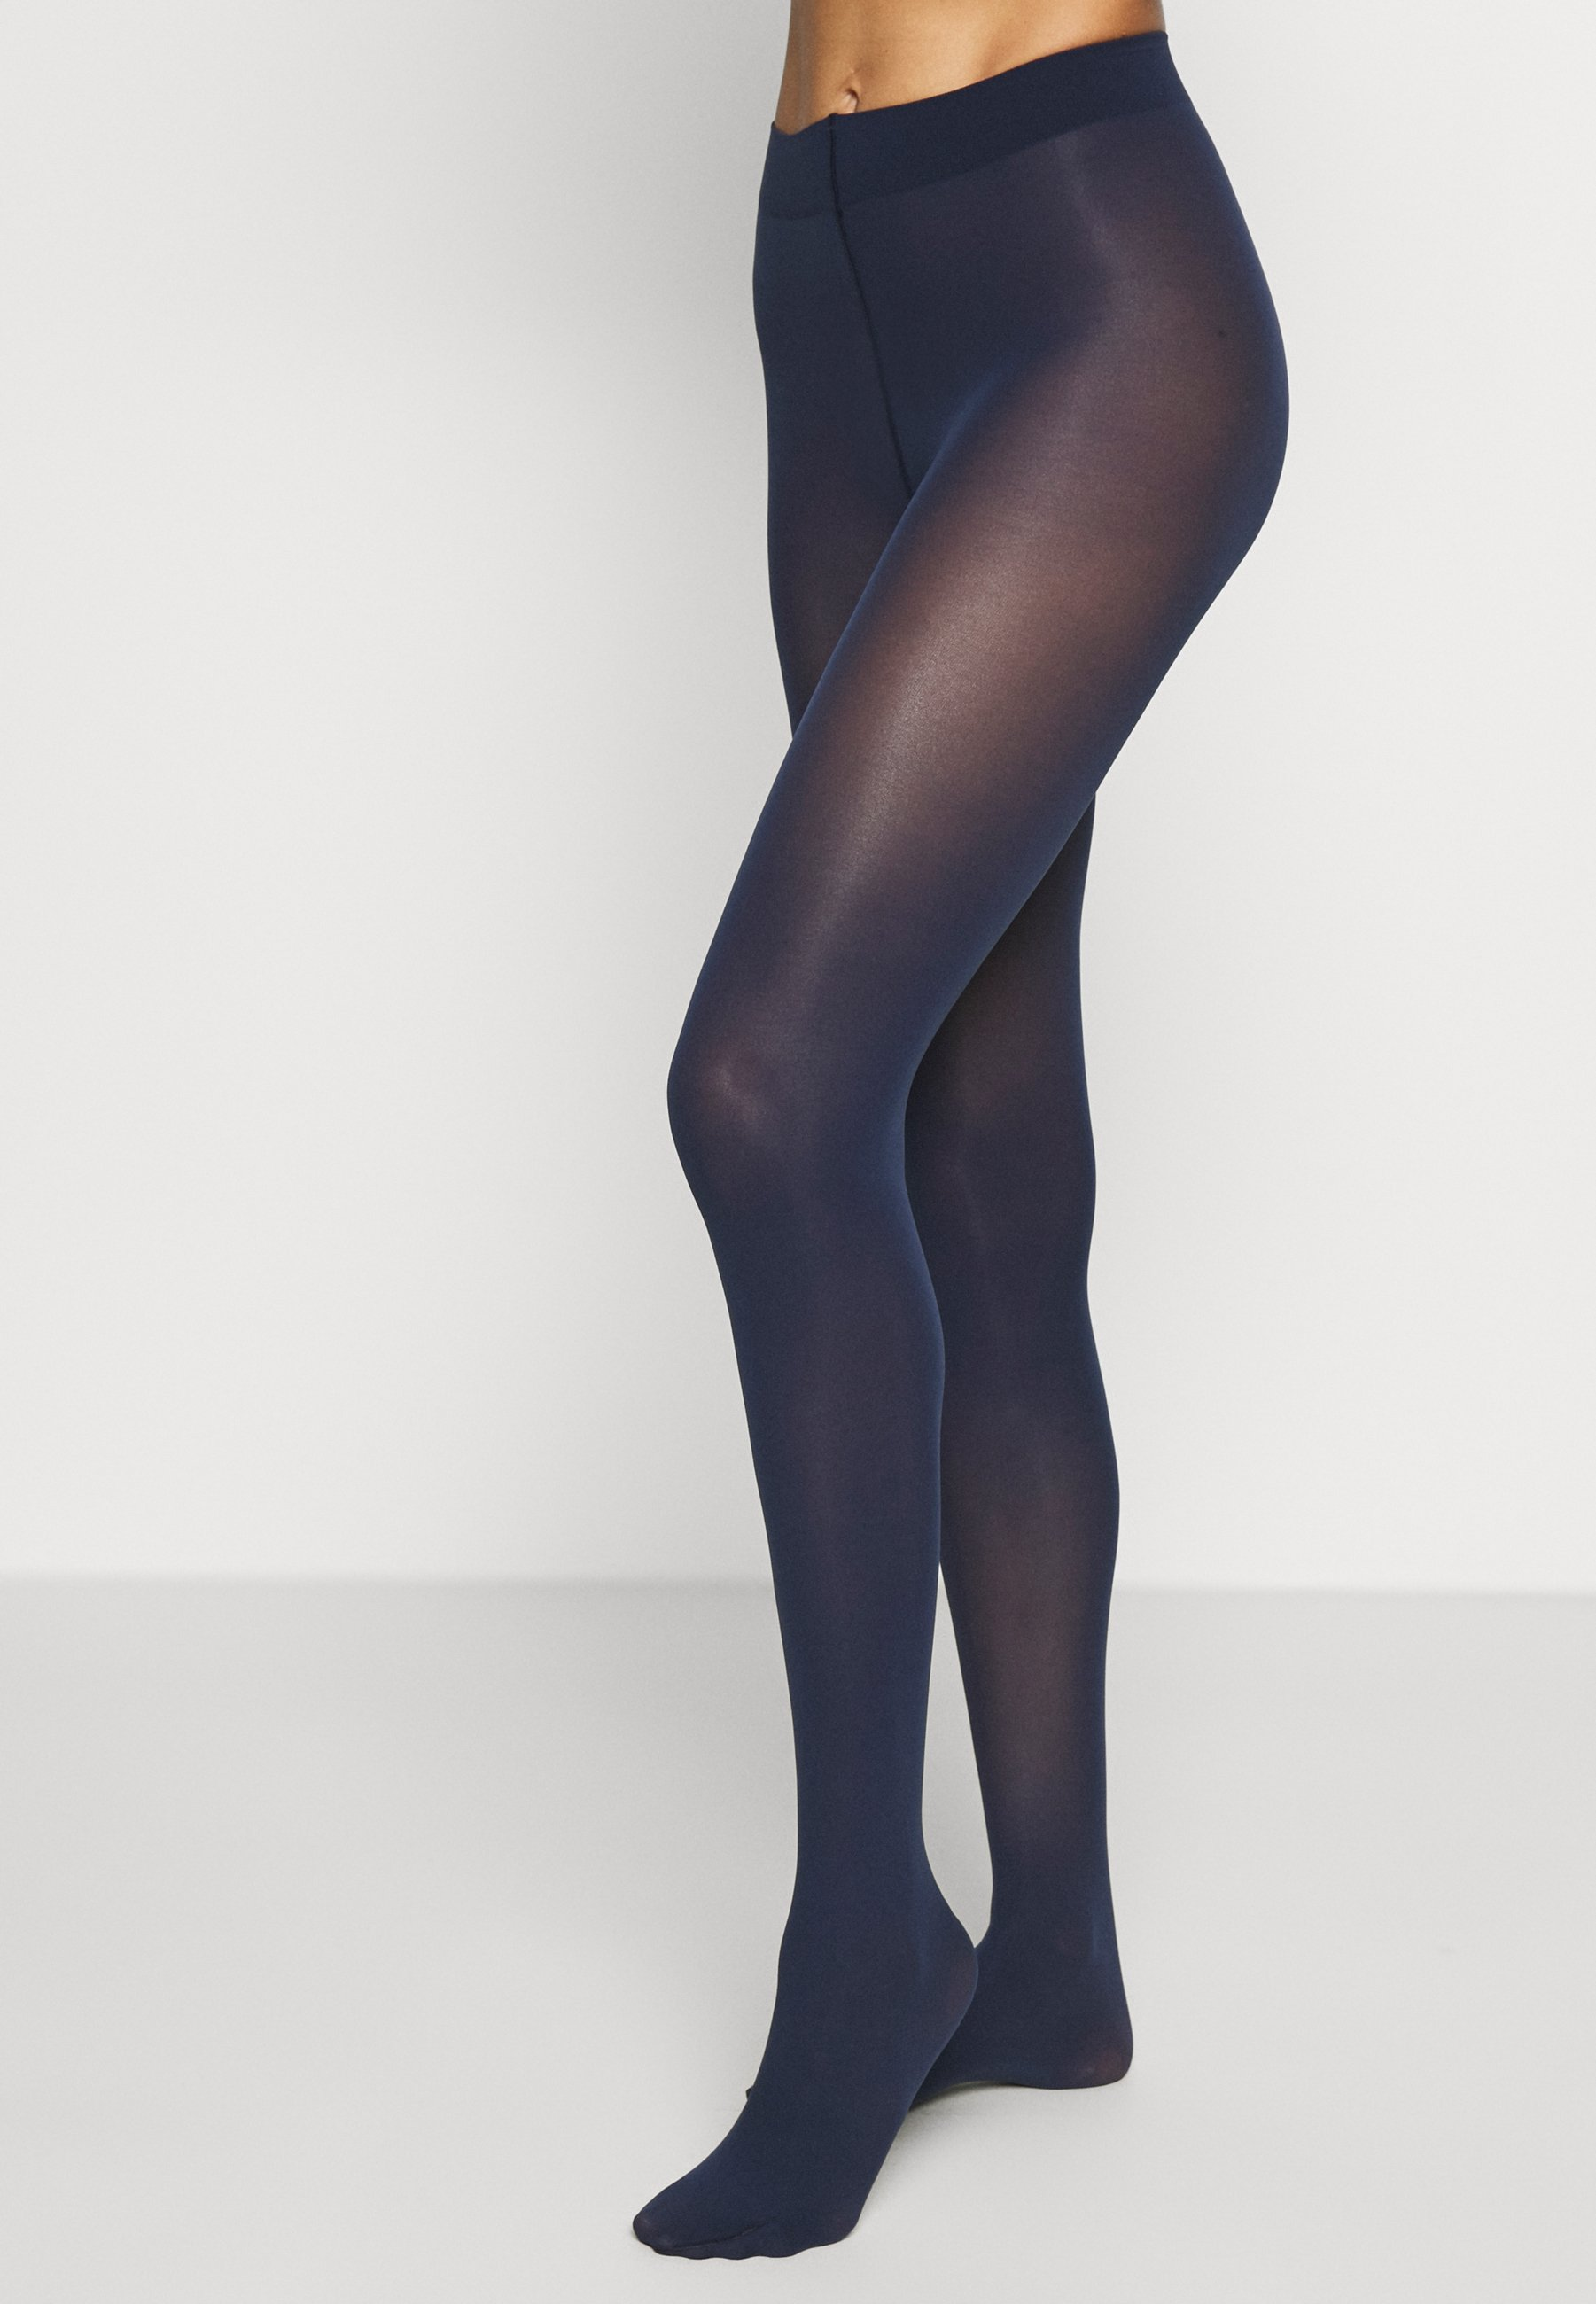 Femme Collants